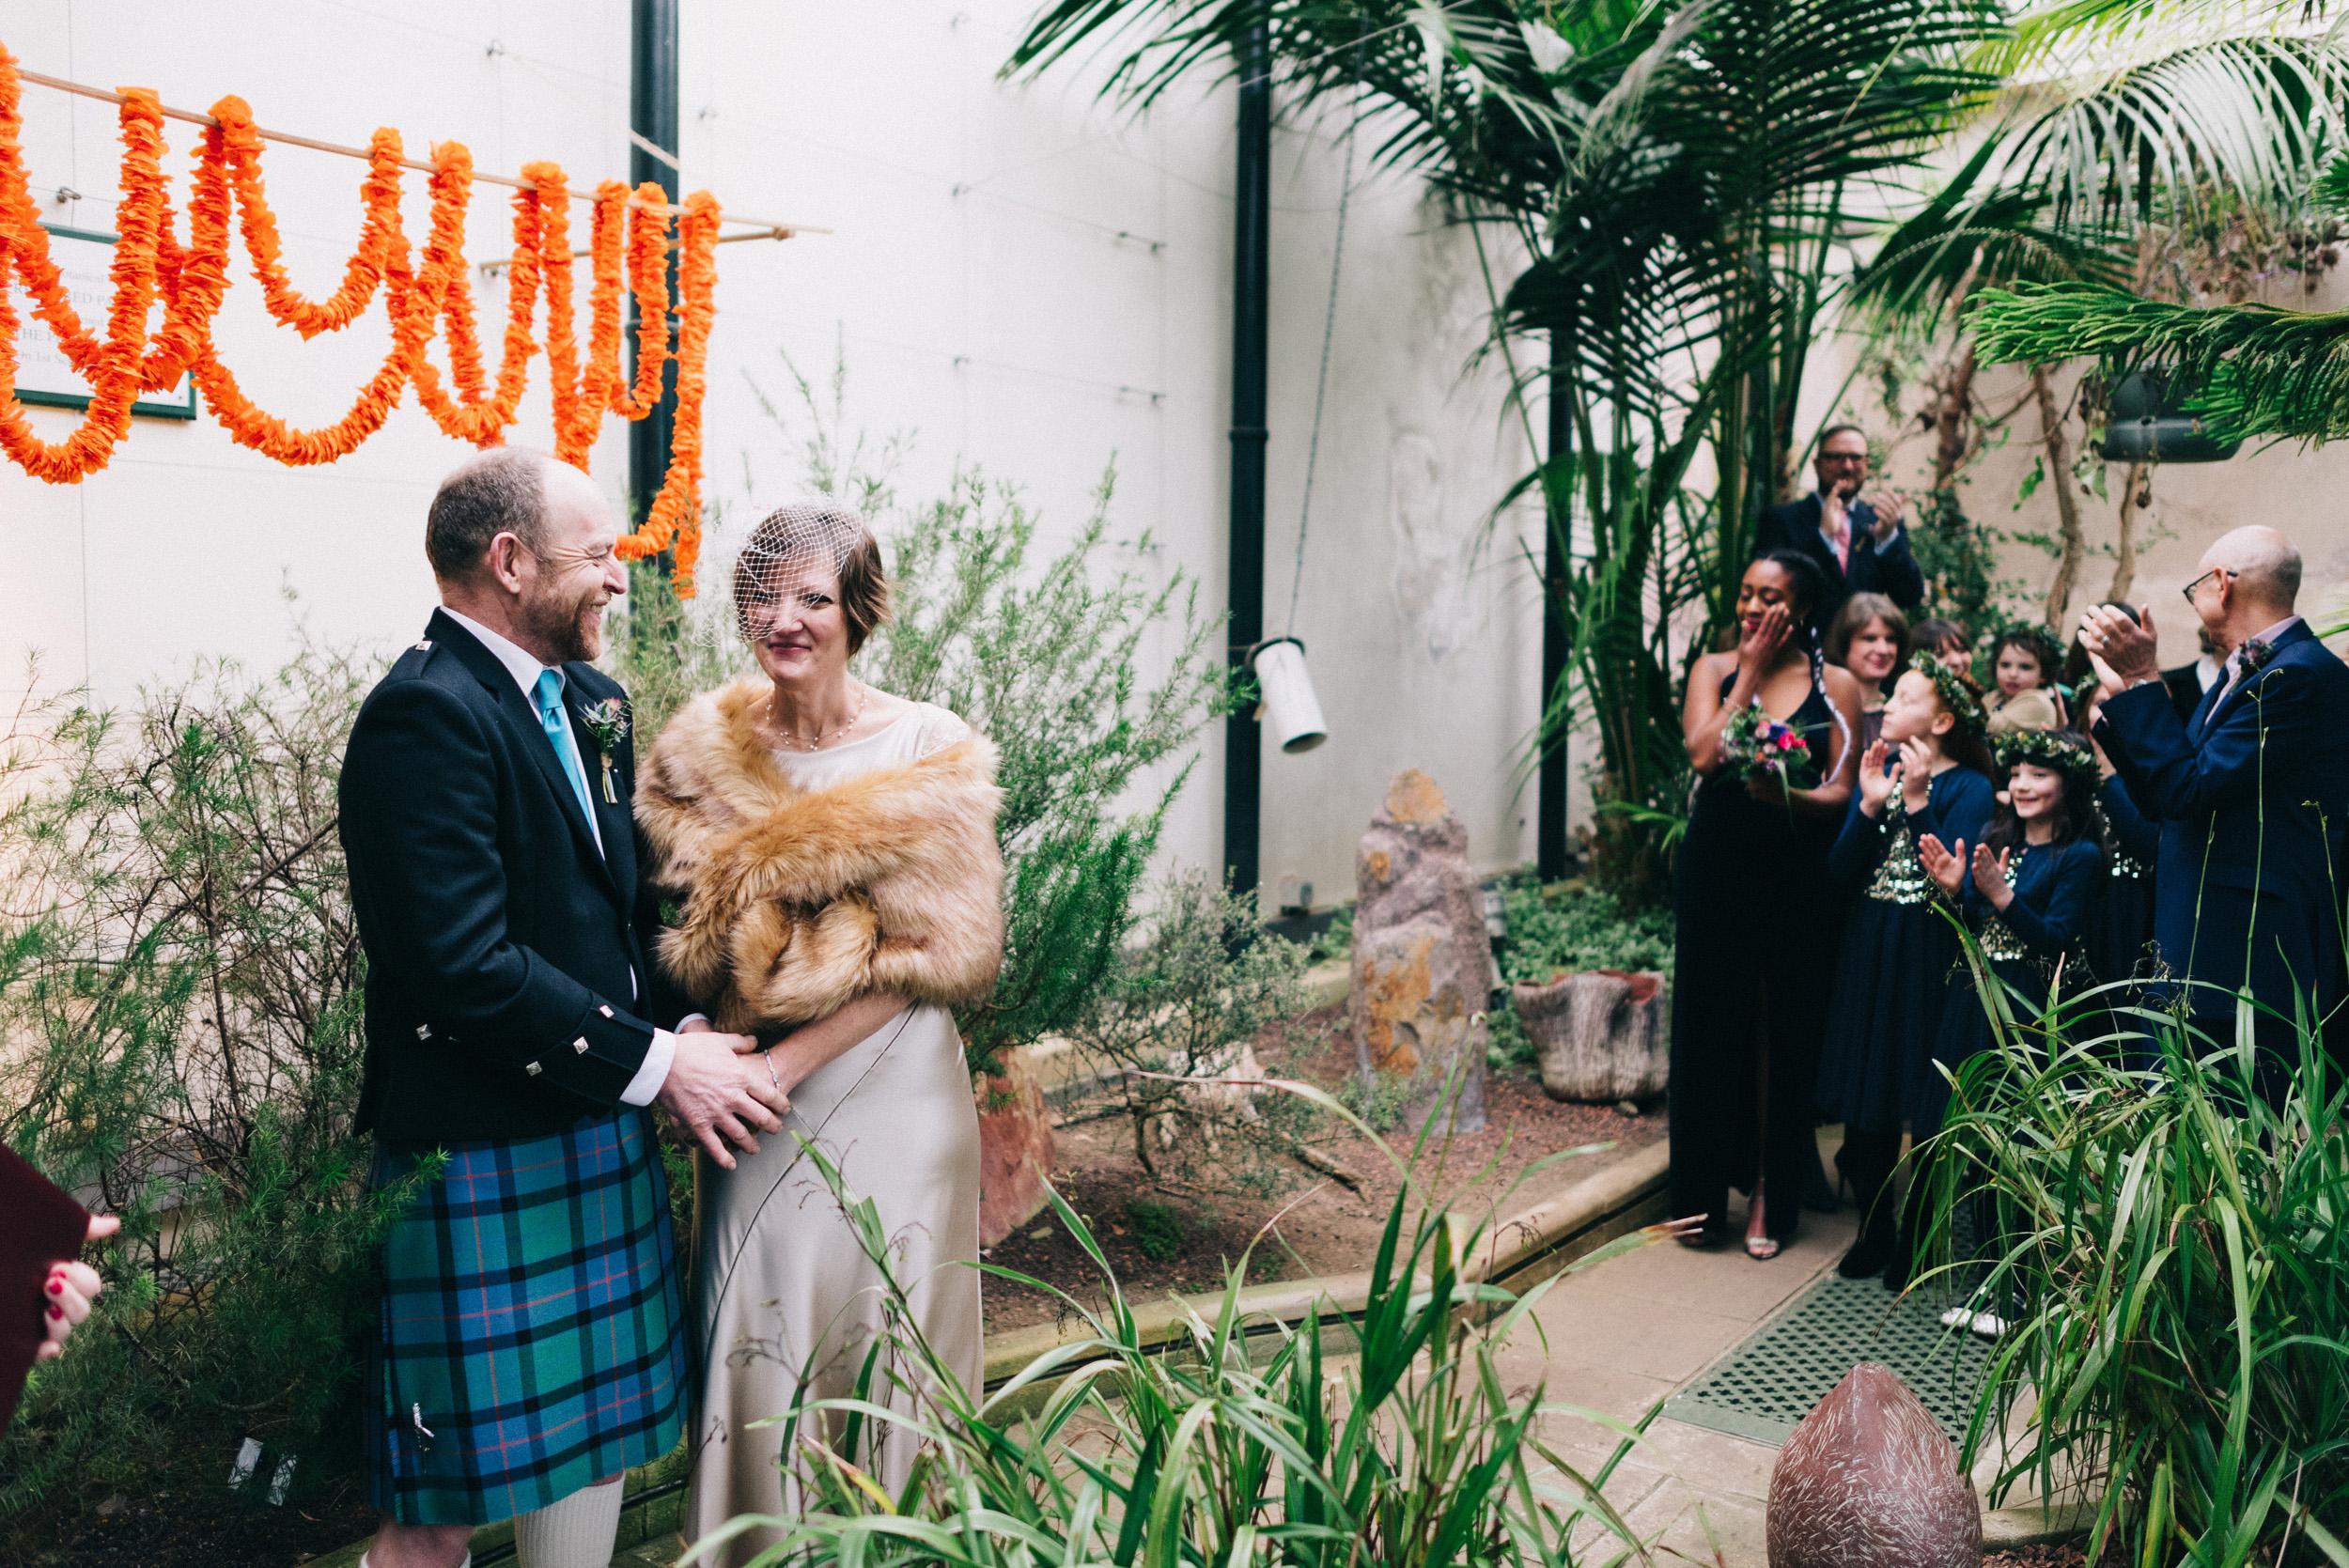 Alice-Bias-Cut-Silk-Wedding-Dress-Kate-Beaumont-Sheffield-Botanical-Gardens-by-Peakography-12.jpg